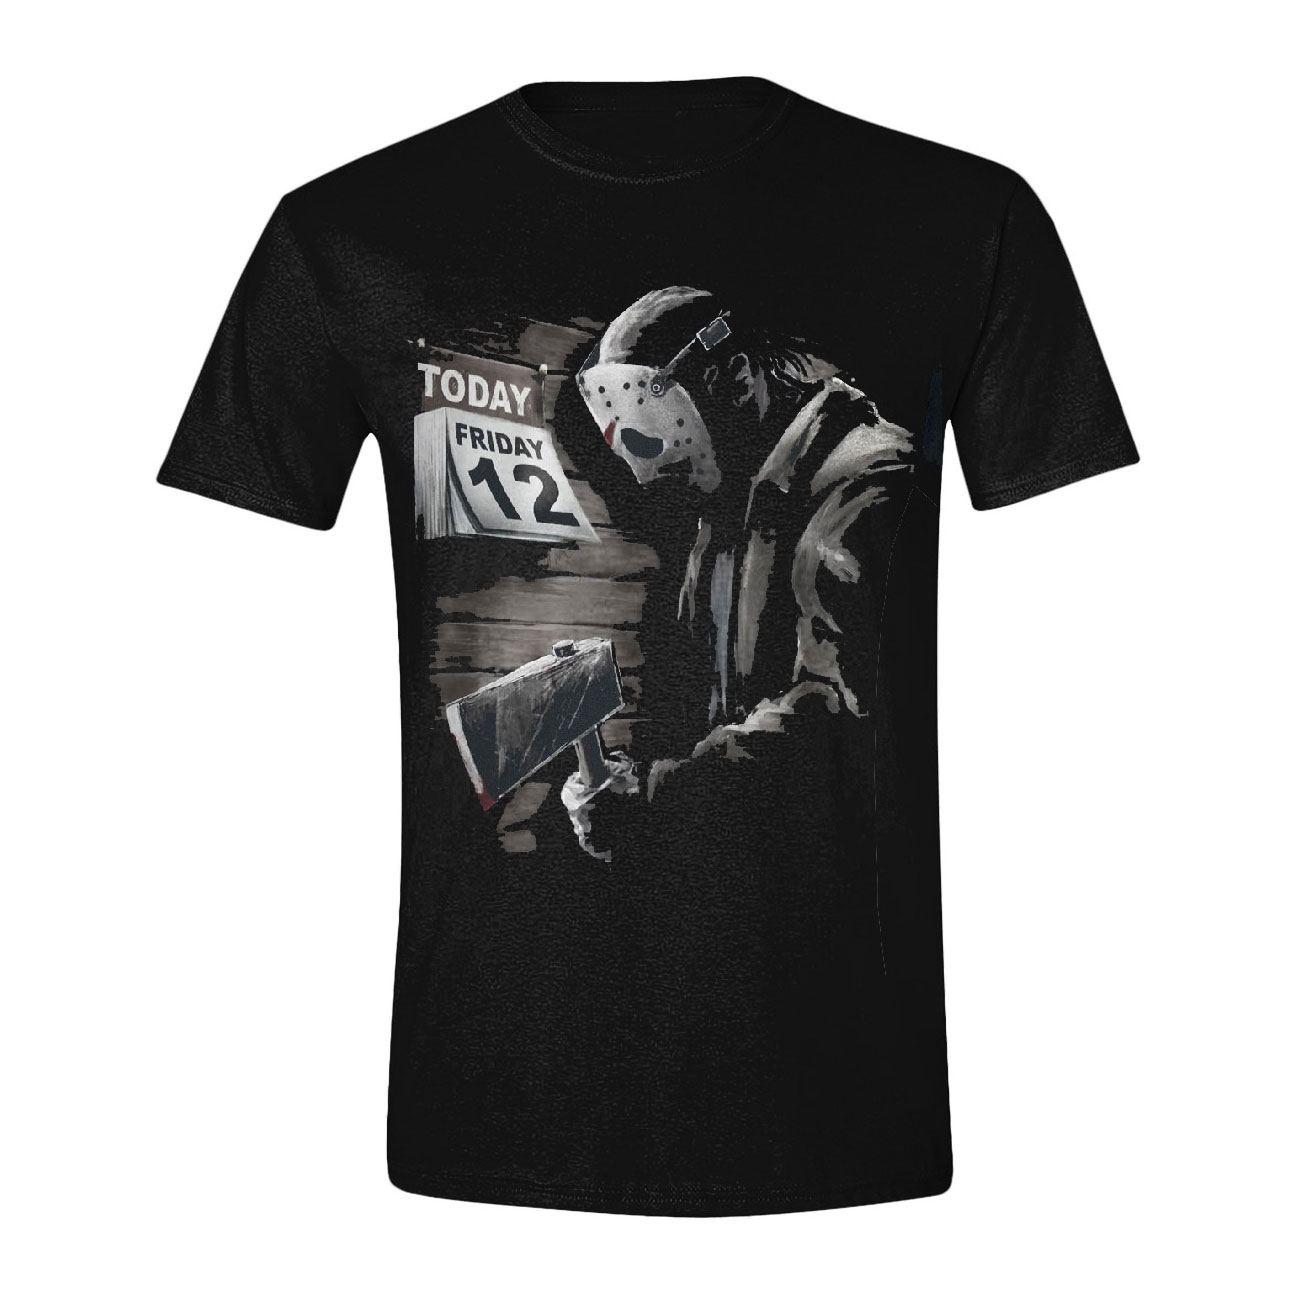 Freddy vs. Jason T-Shirt Friday 12th Sad Size S